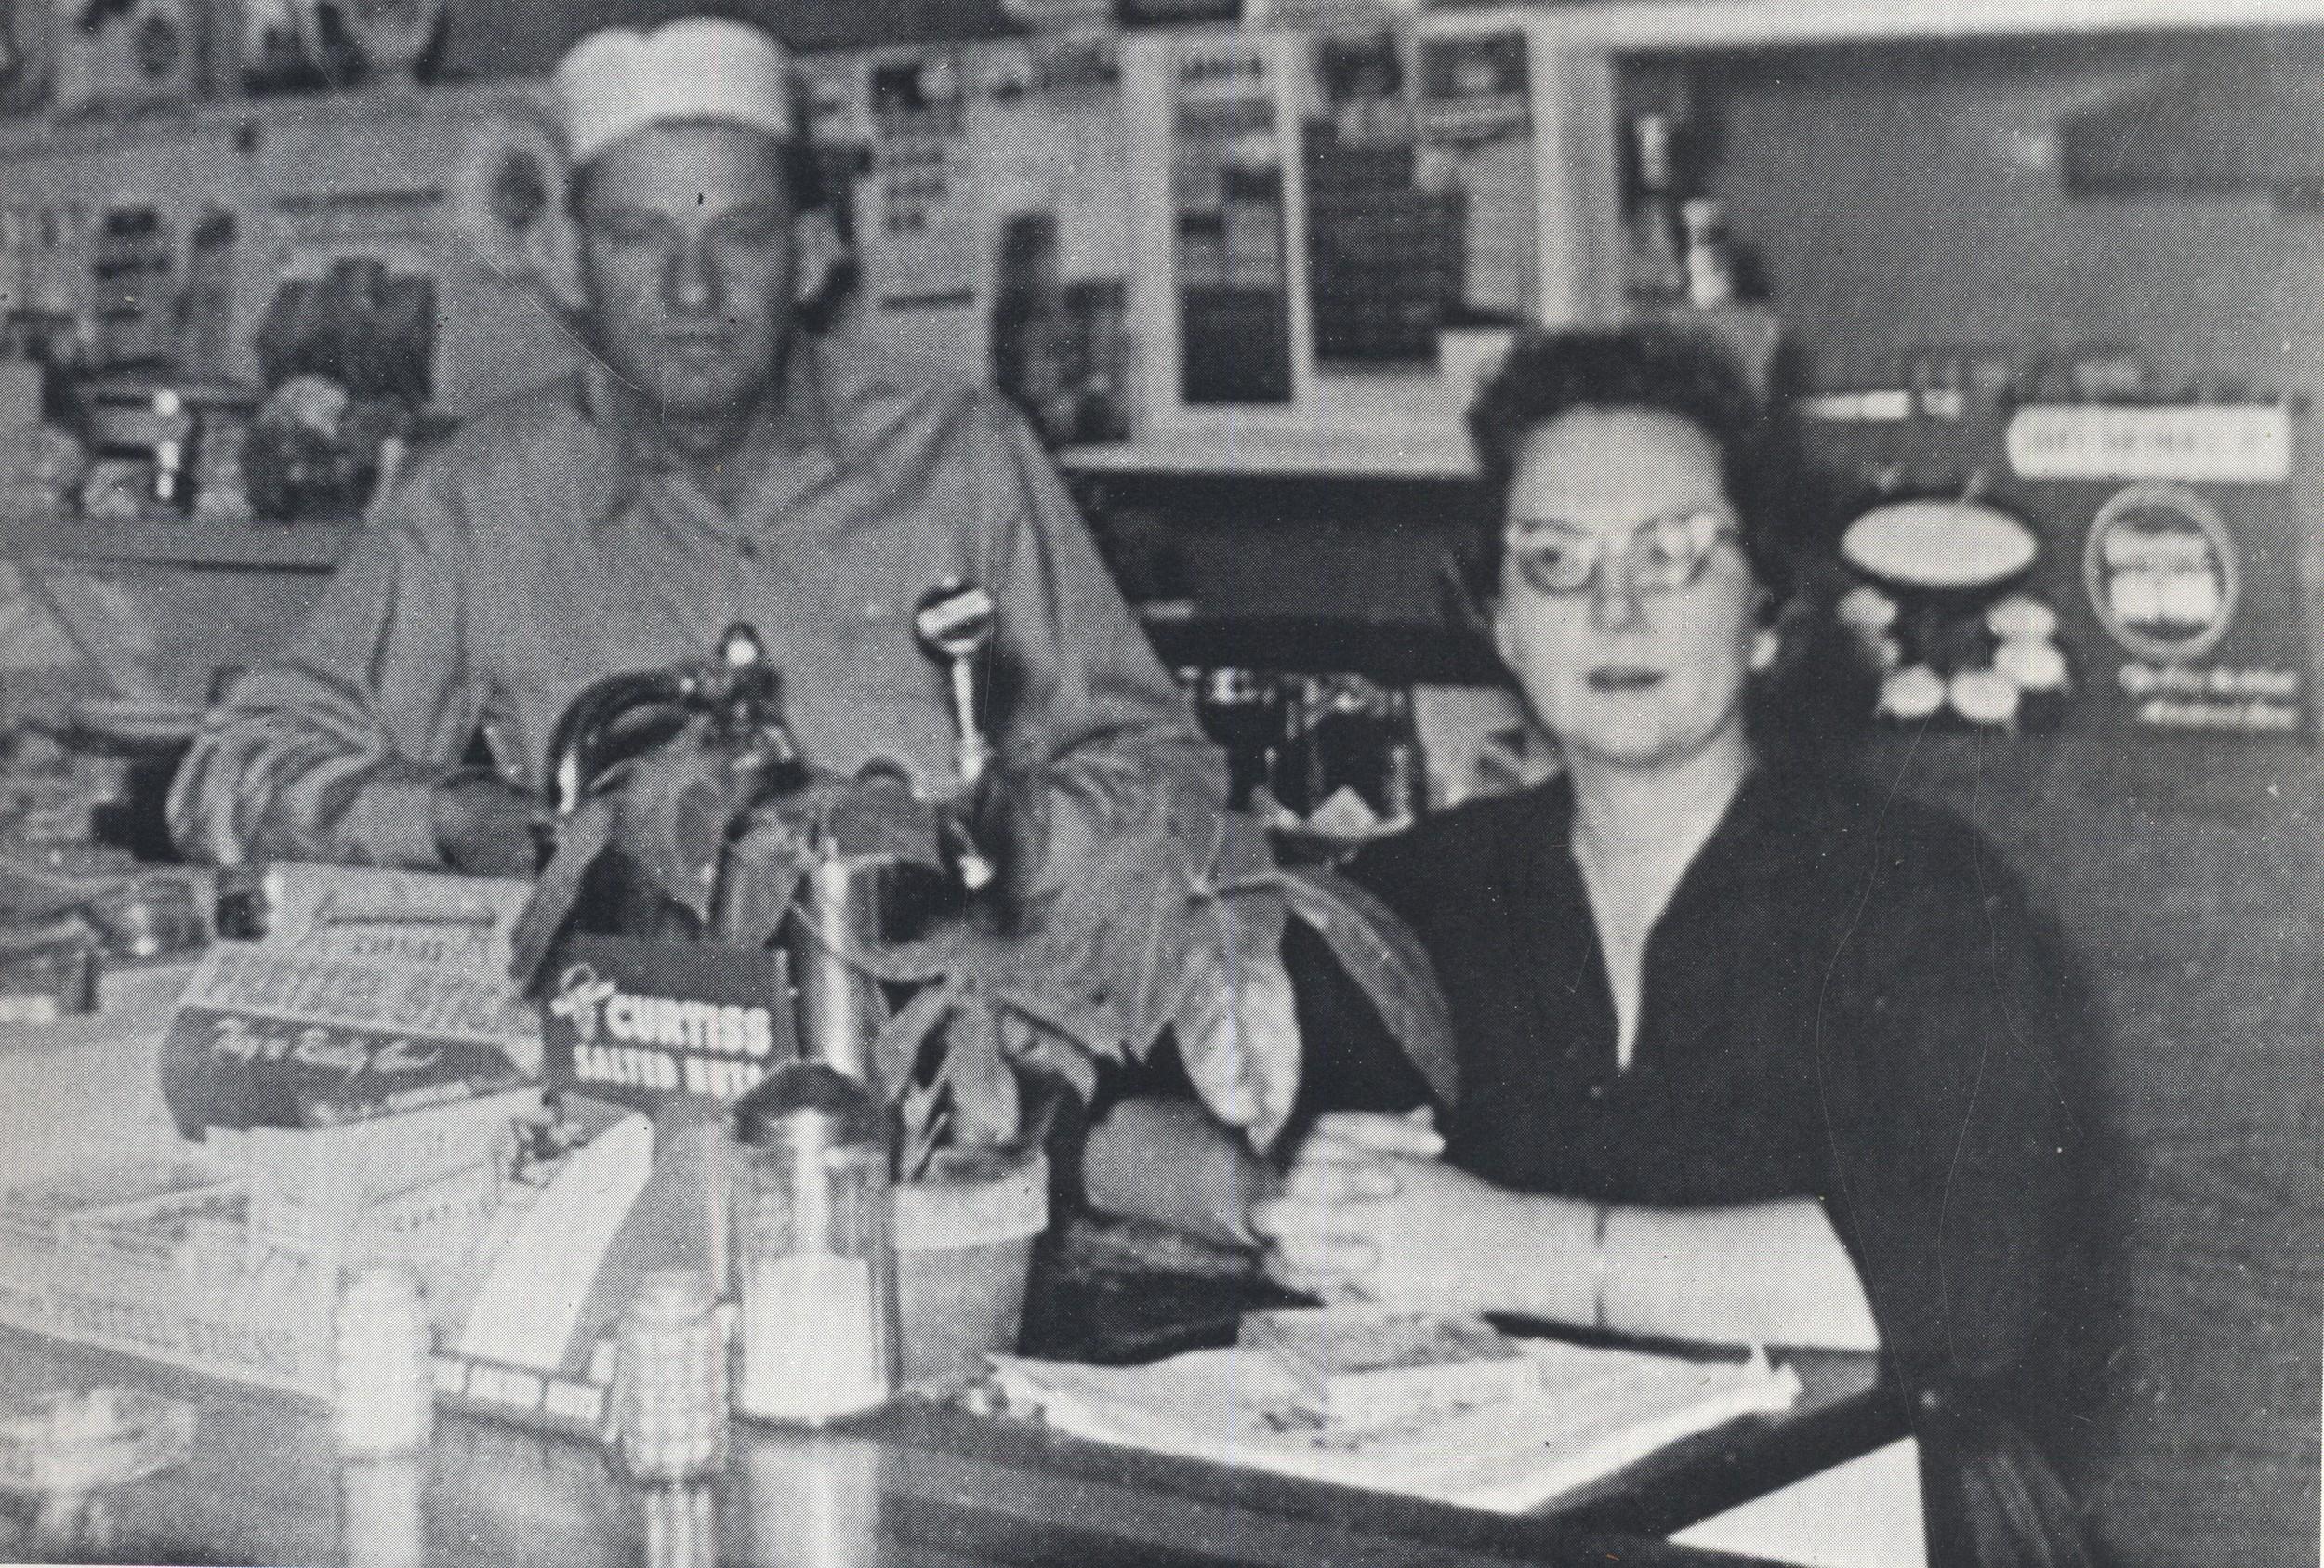 White Horse Cafe, 1950s.